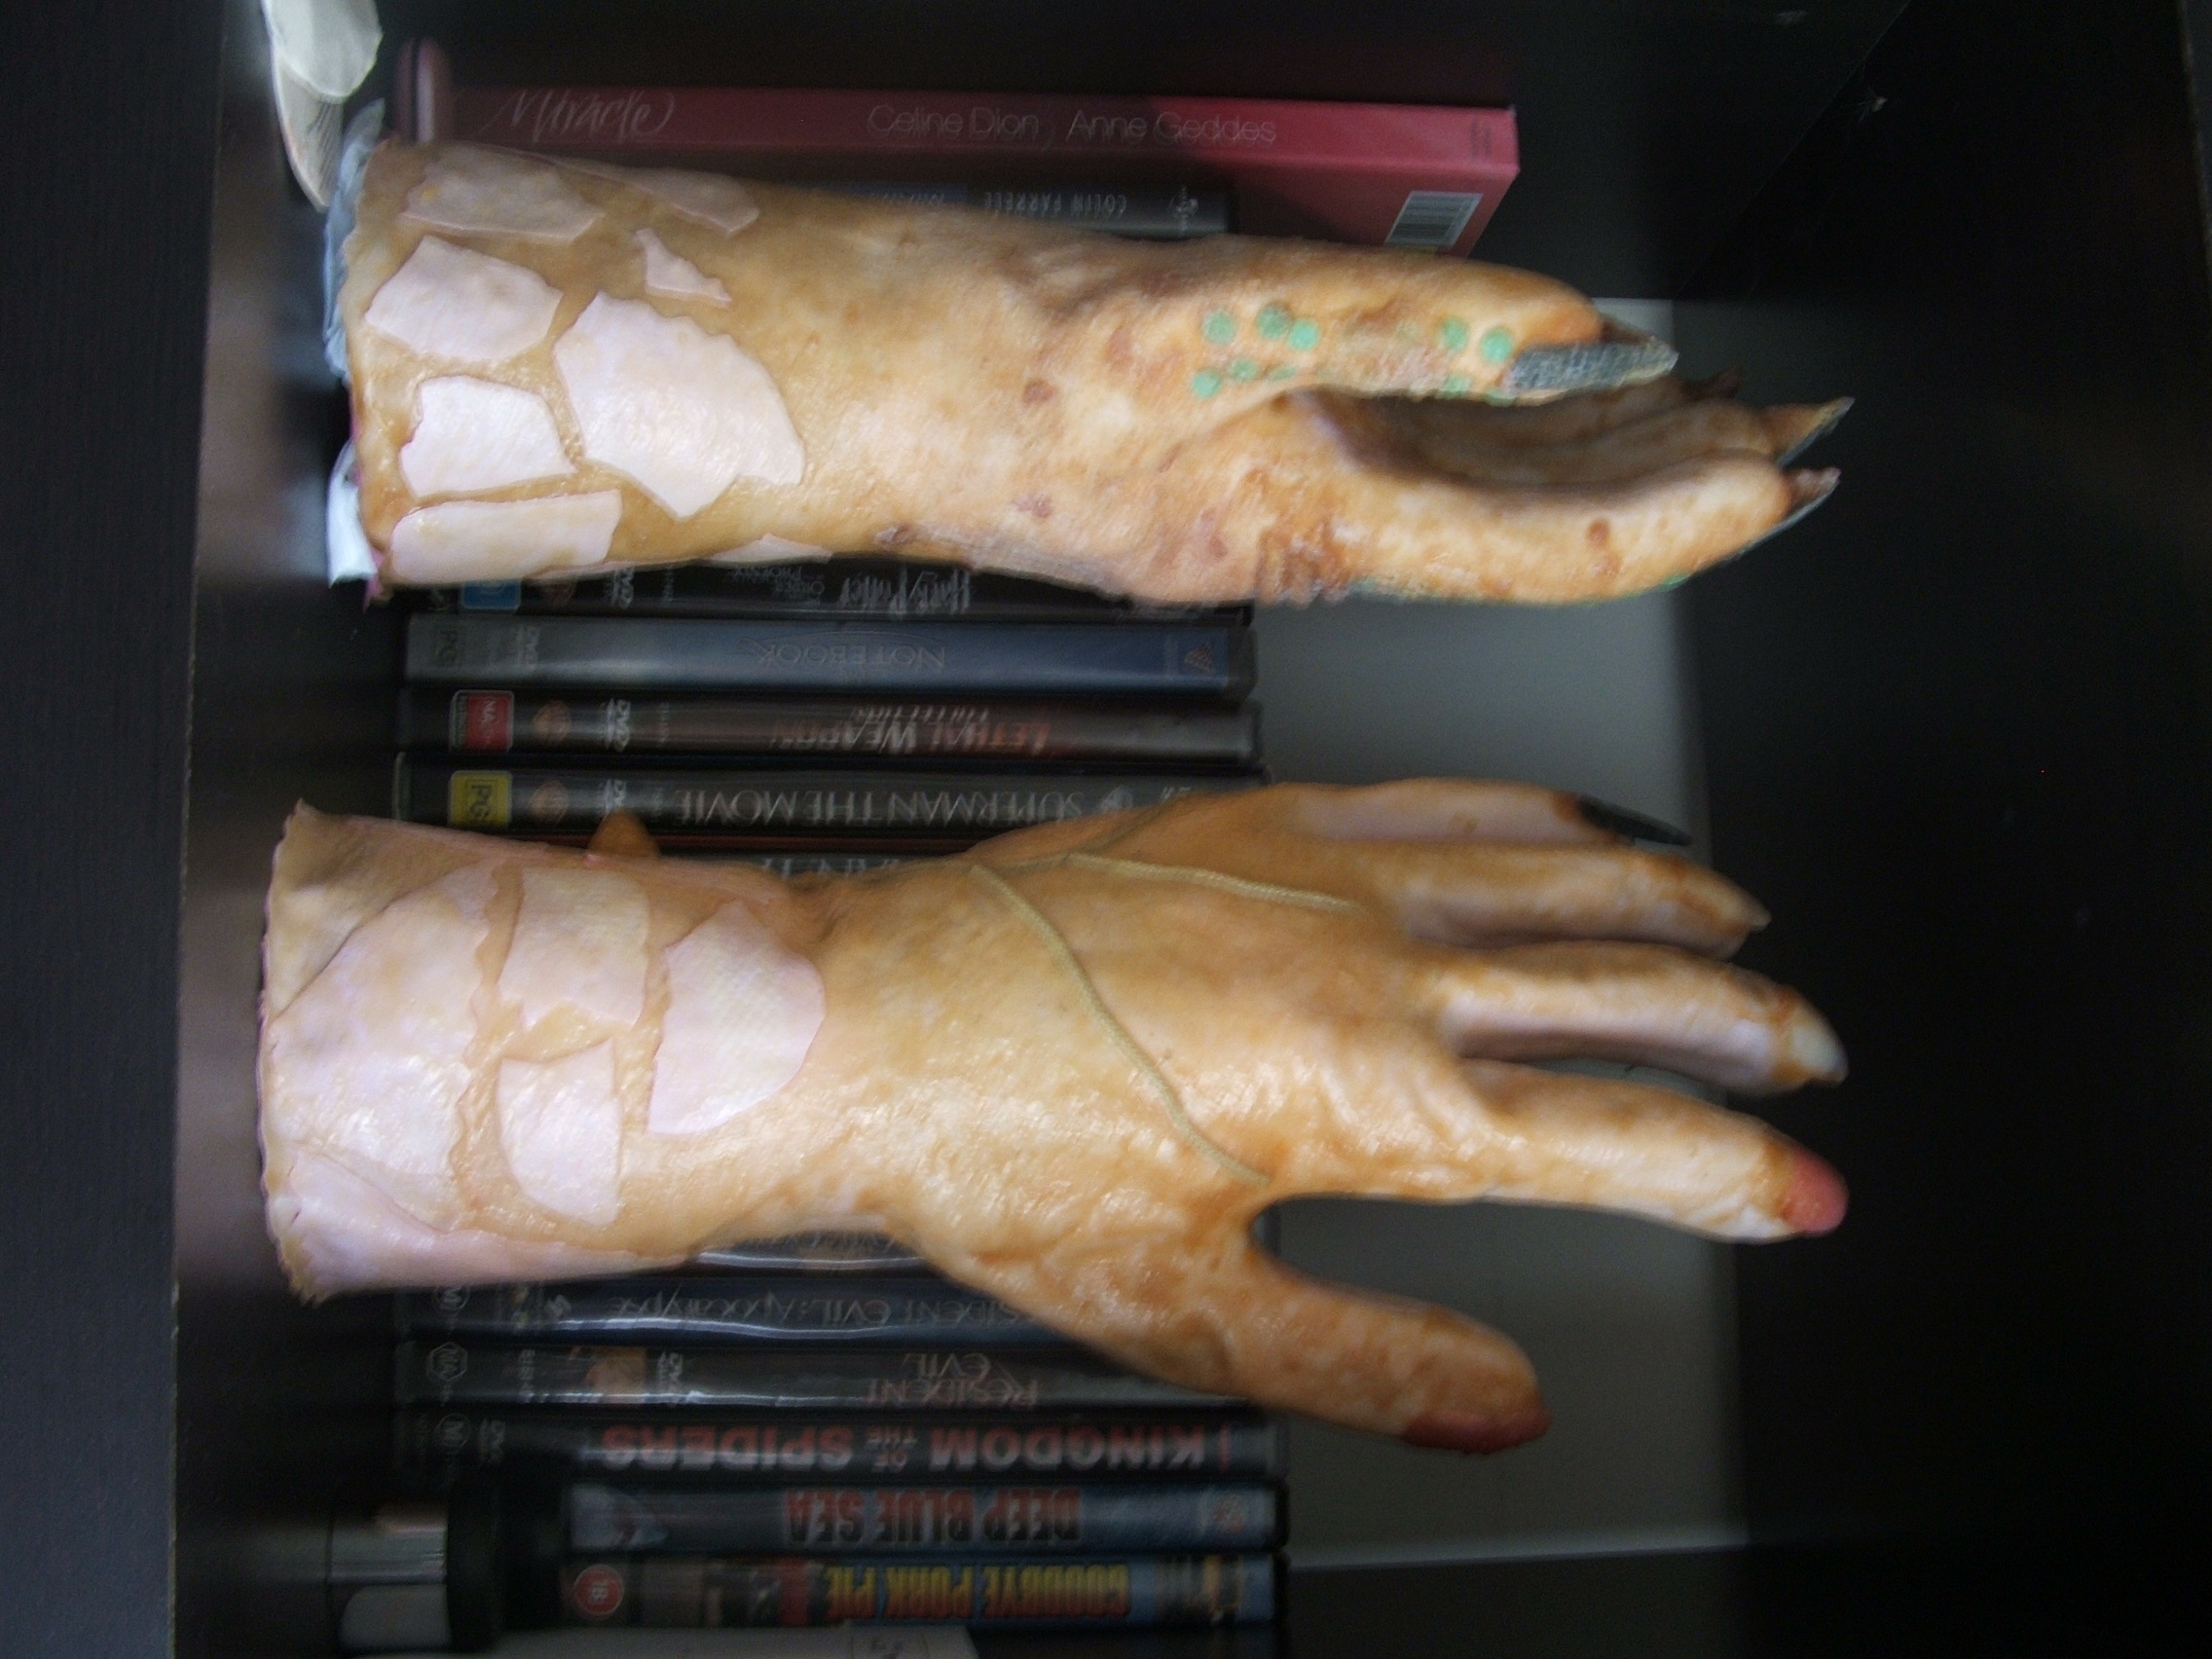 Two hands 1.JPG